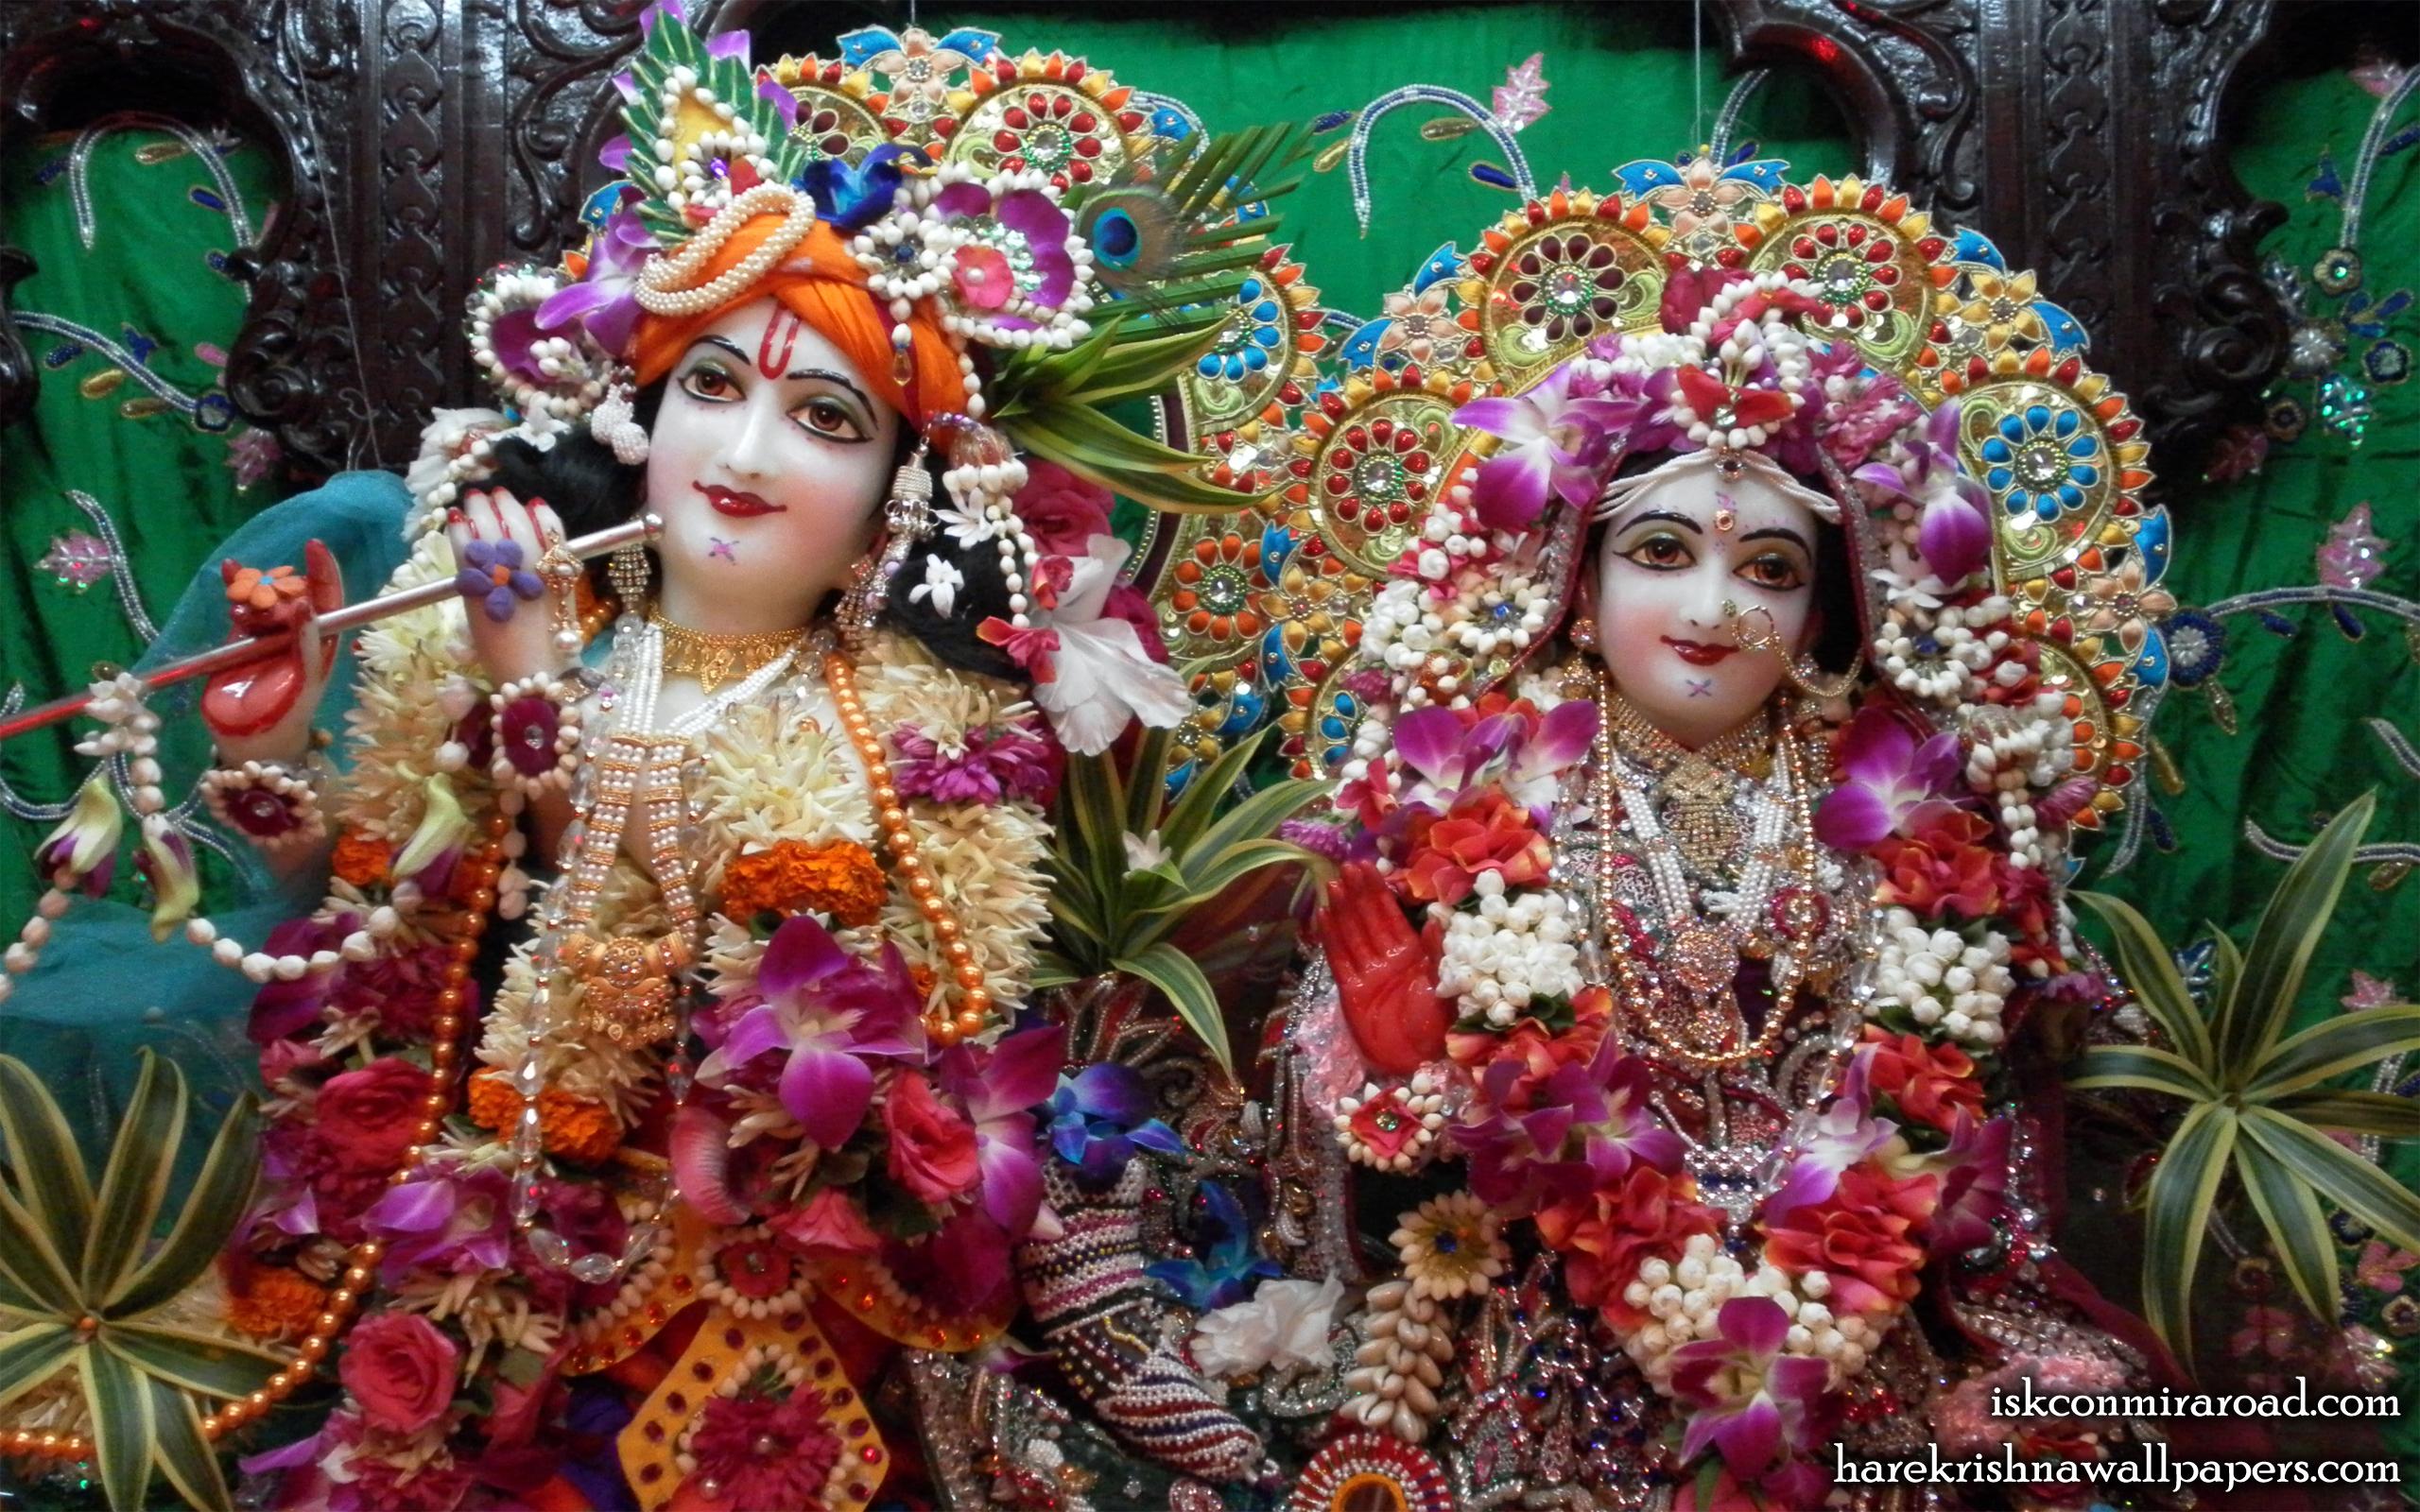 Sri Sri Radha Giridhari Close up Wallpaper (004) Size 2560x1600 Download